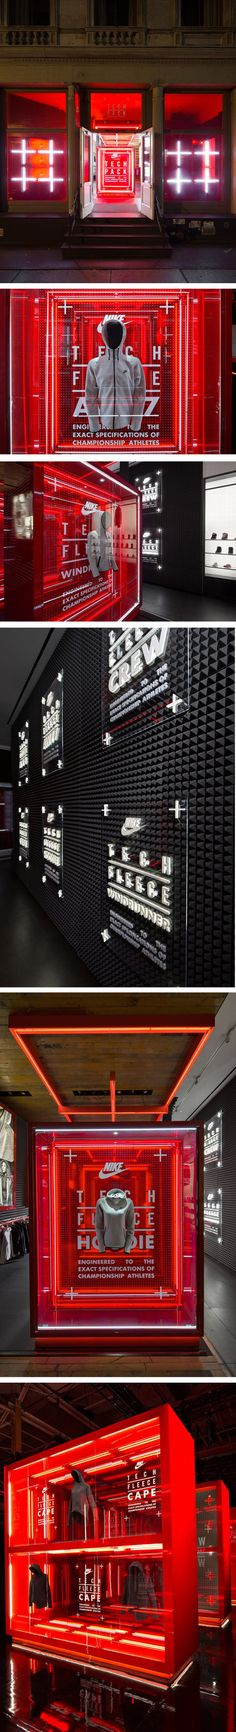 Nike flagship store by Nike  WeShouldDoItAll  Corey Yurkovich, New York City.